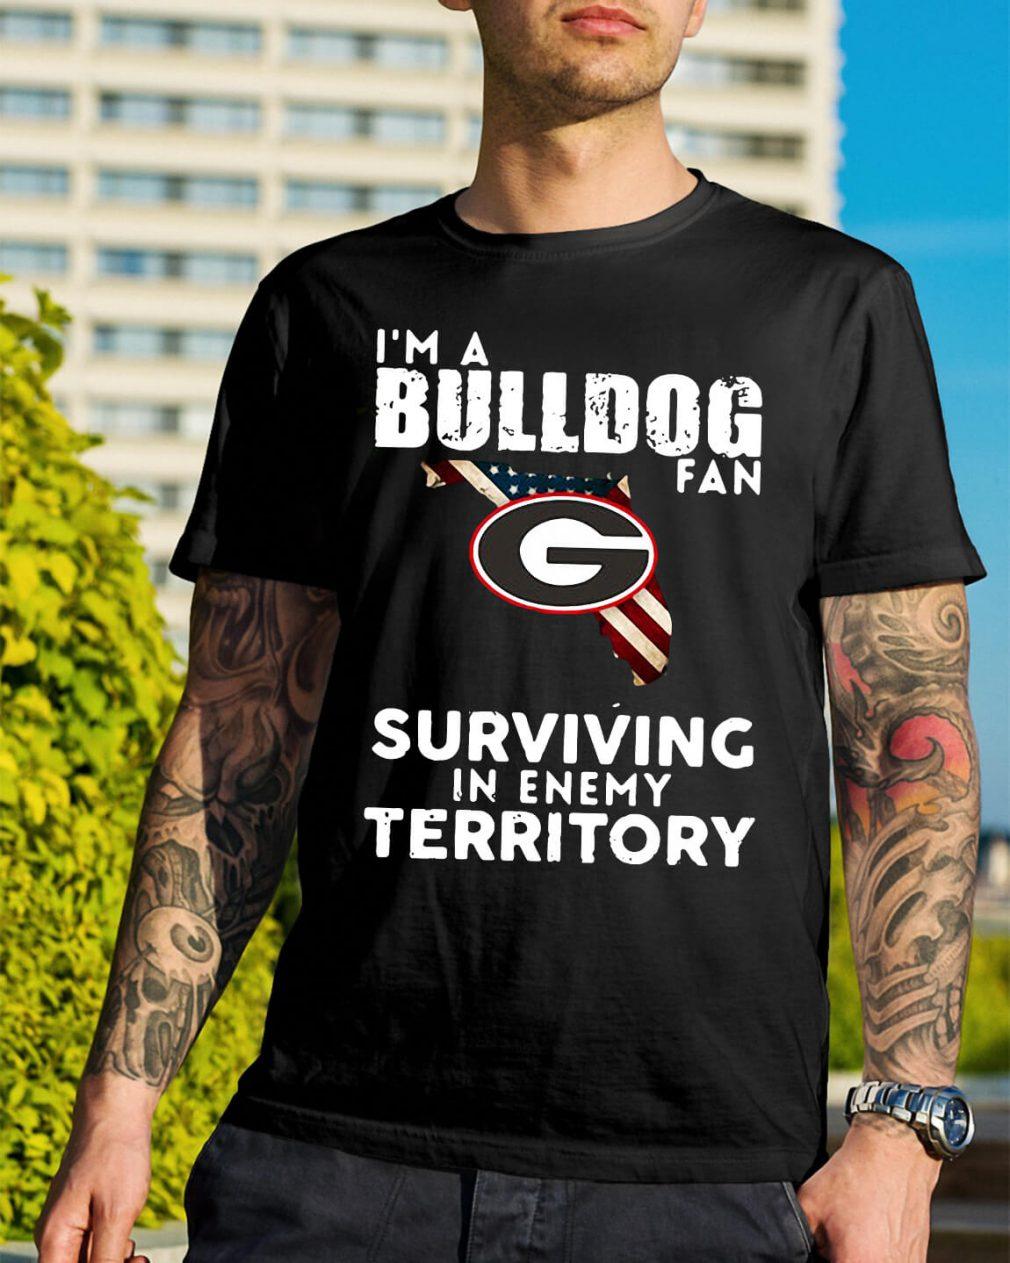 University of Georgia I'm a Bulldog fan Surviving Territory shirt